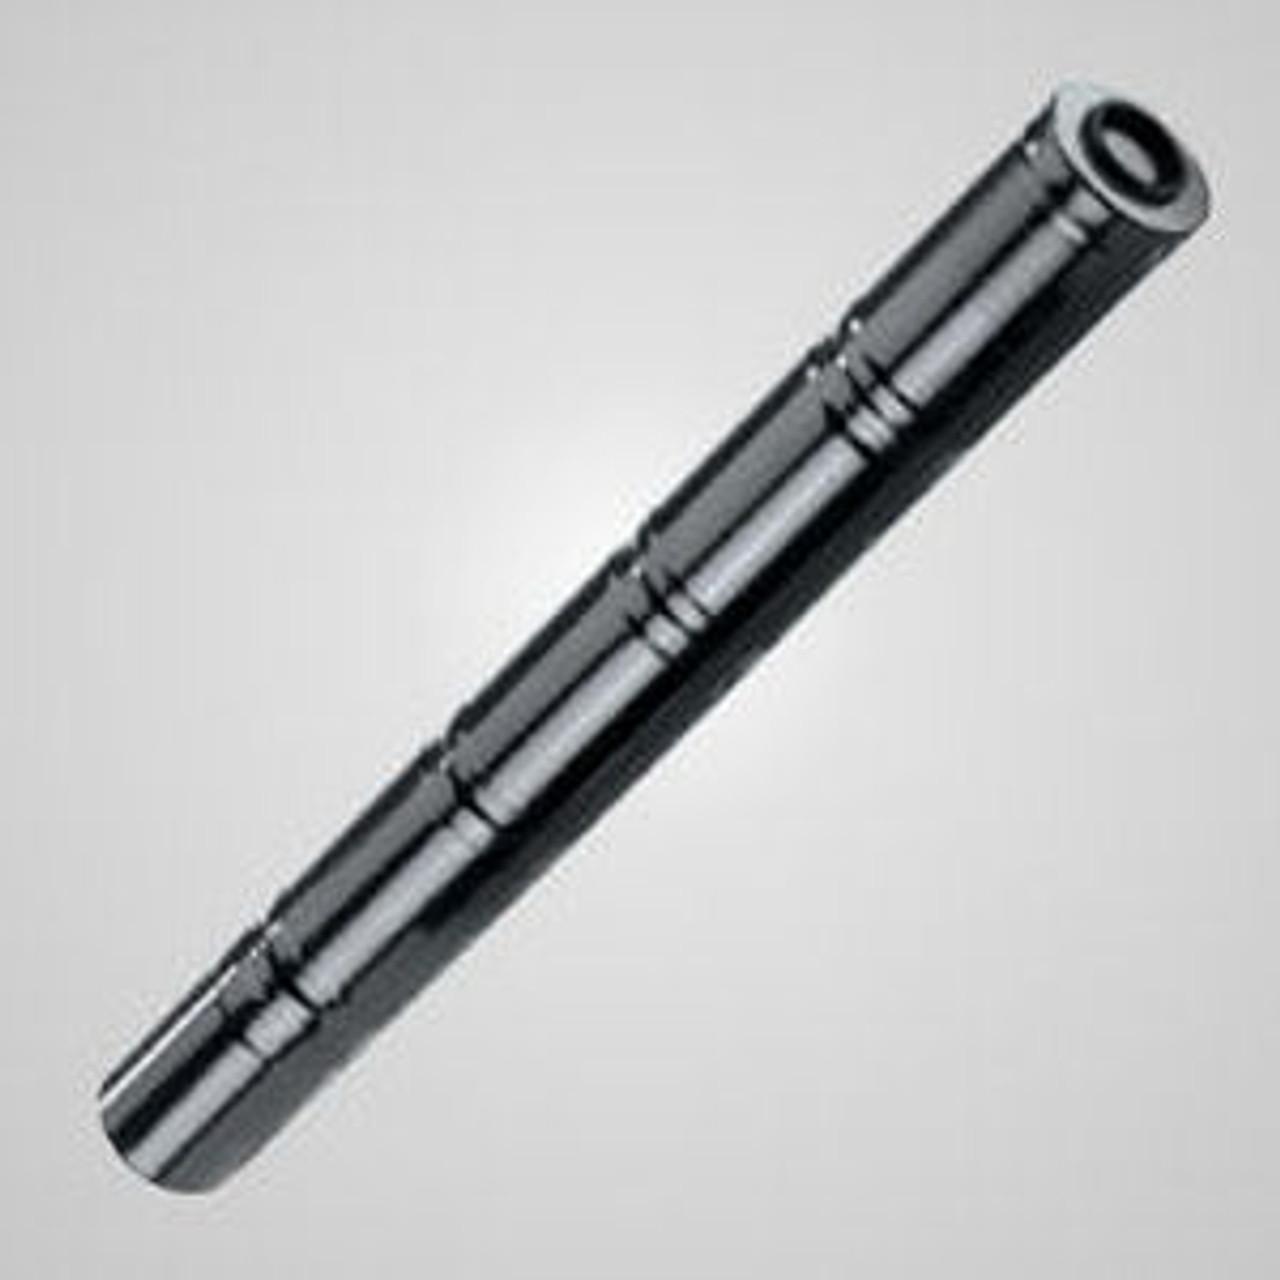 Streamlight SL-20XP-LED Battery - 1800mAh Ni-Cd